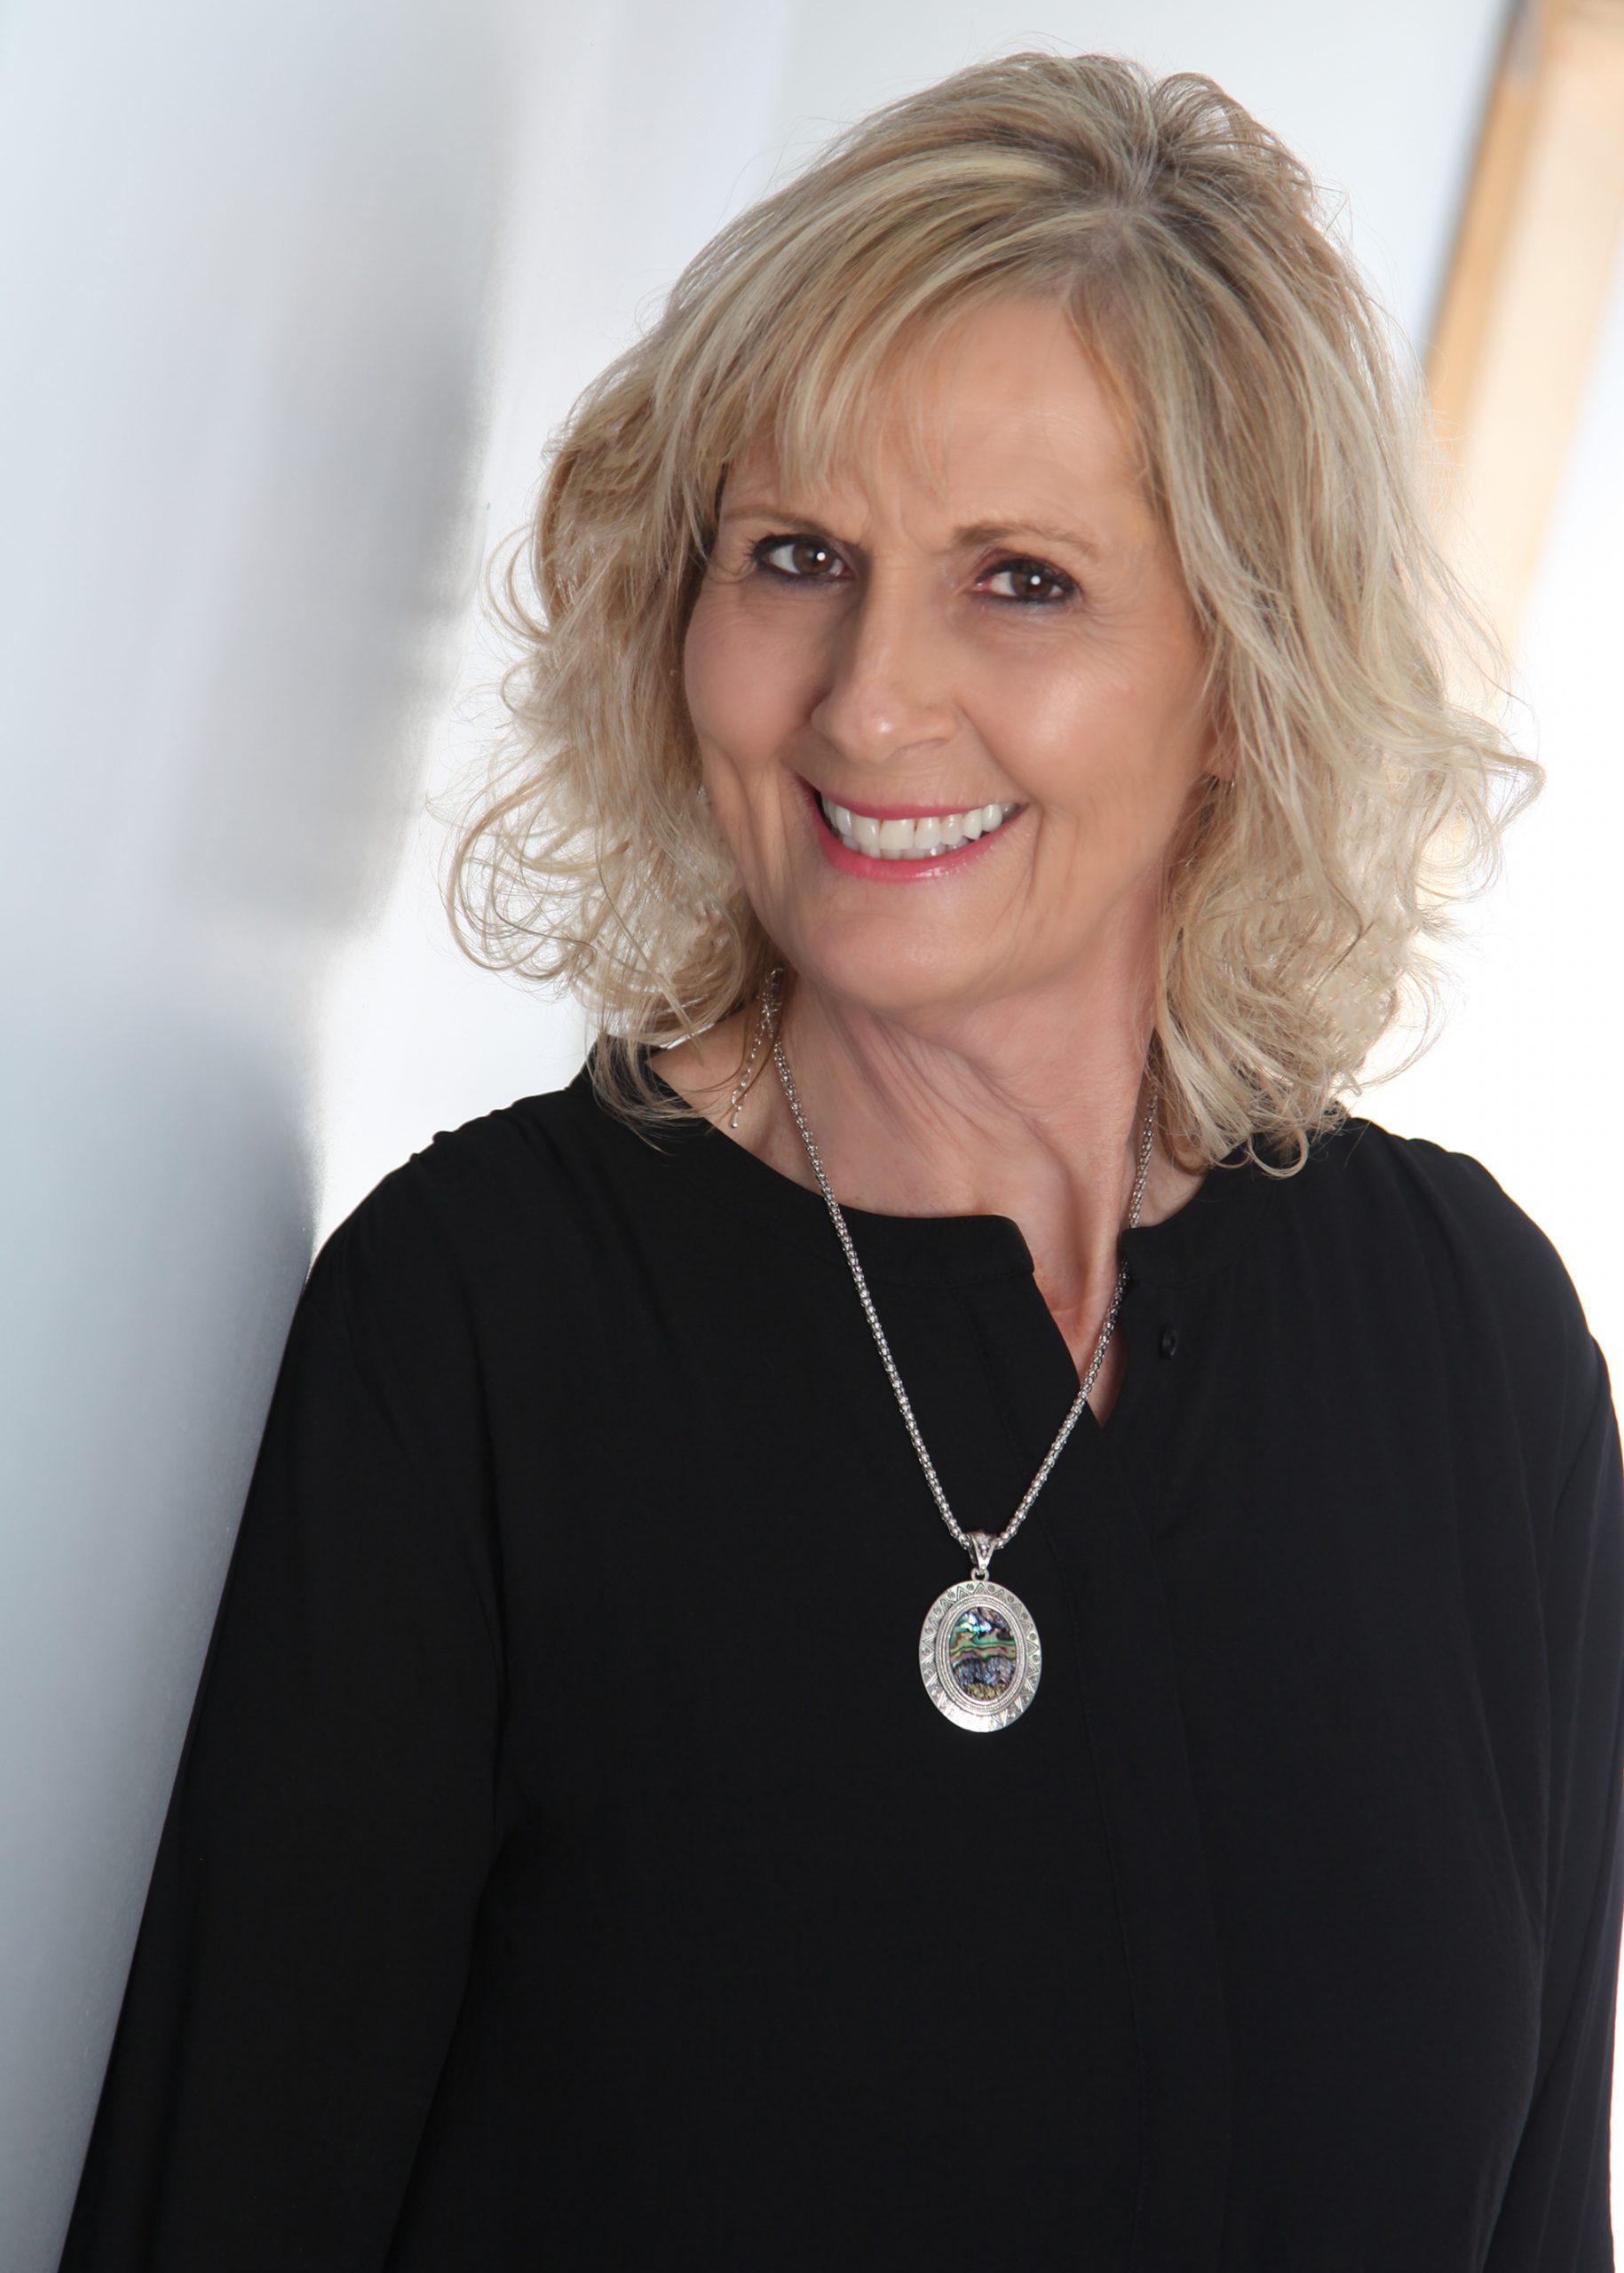 Linda Yaworski